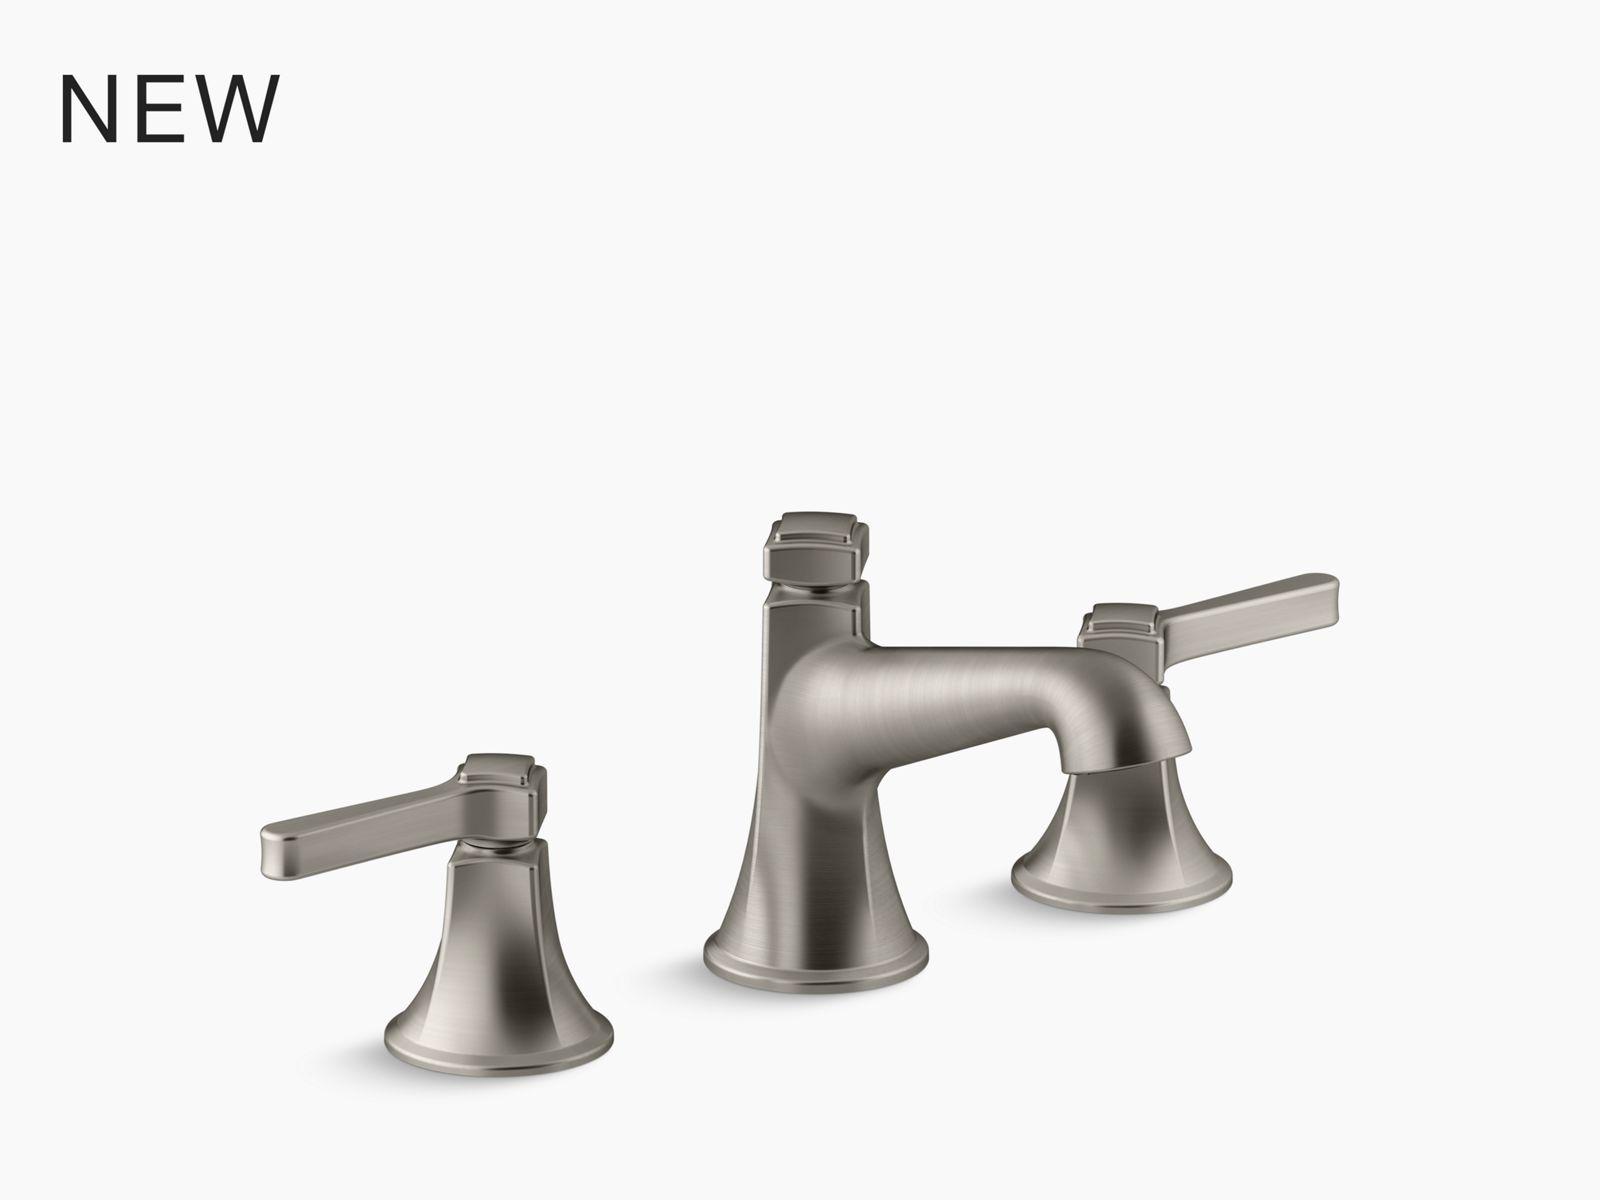 kohler bathroom pedestal sinks artcomcrea